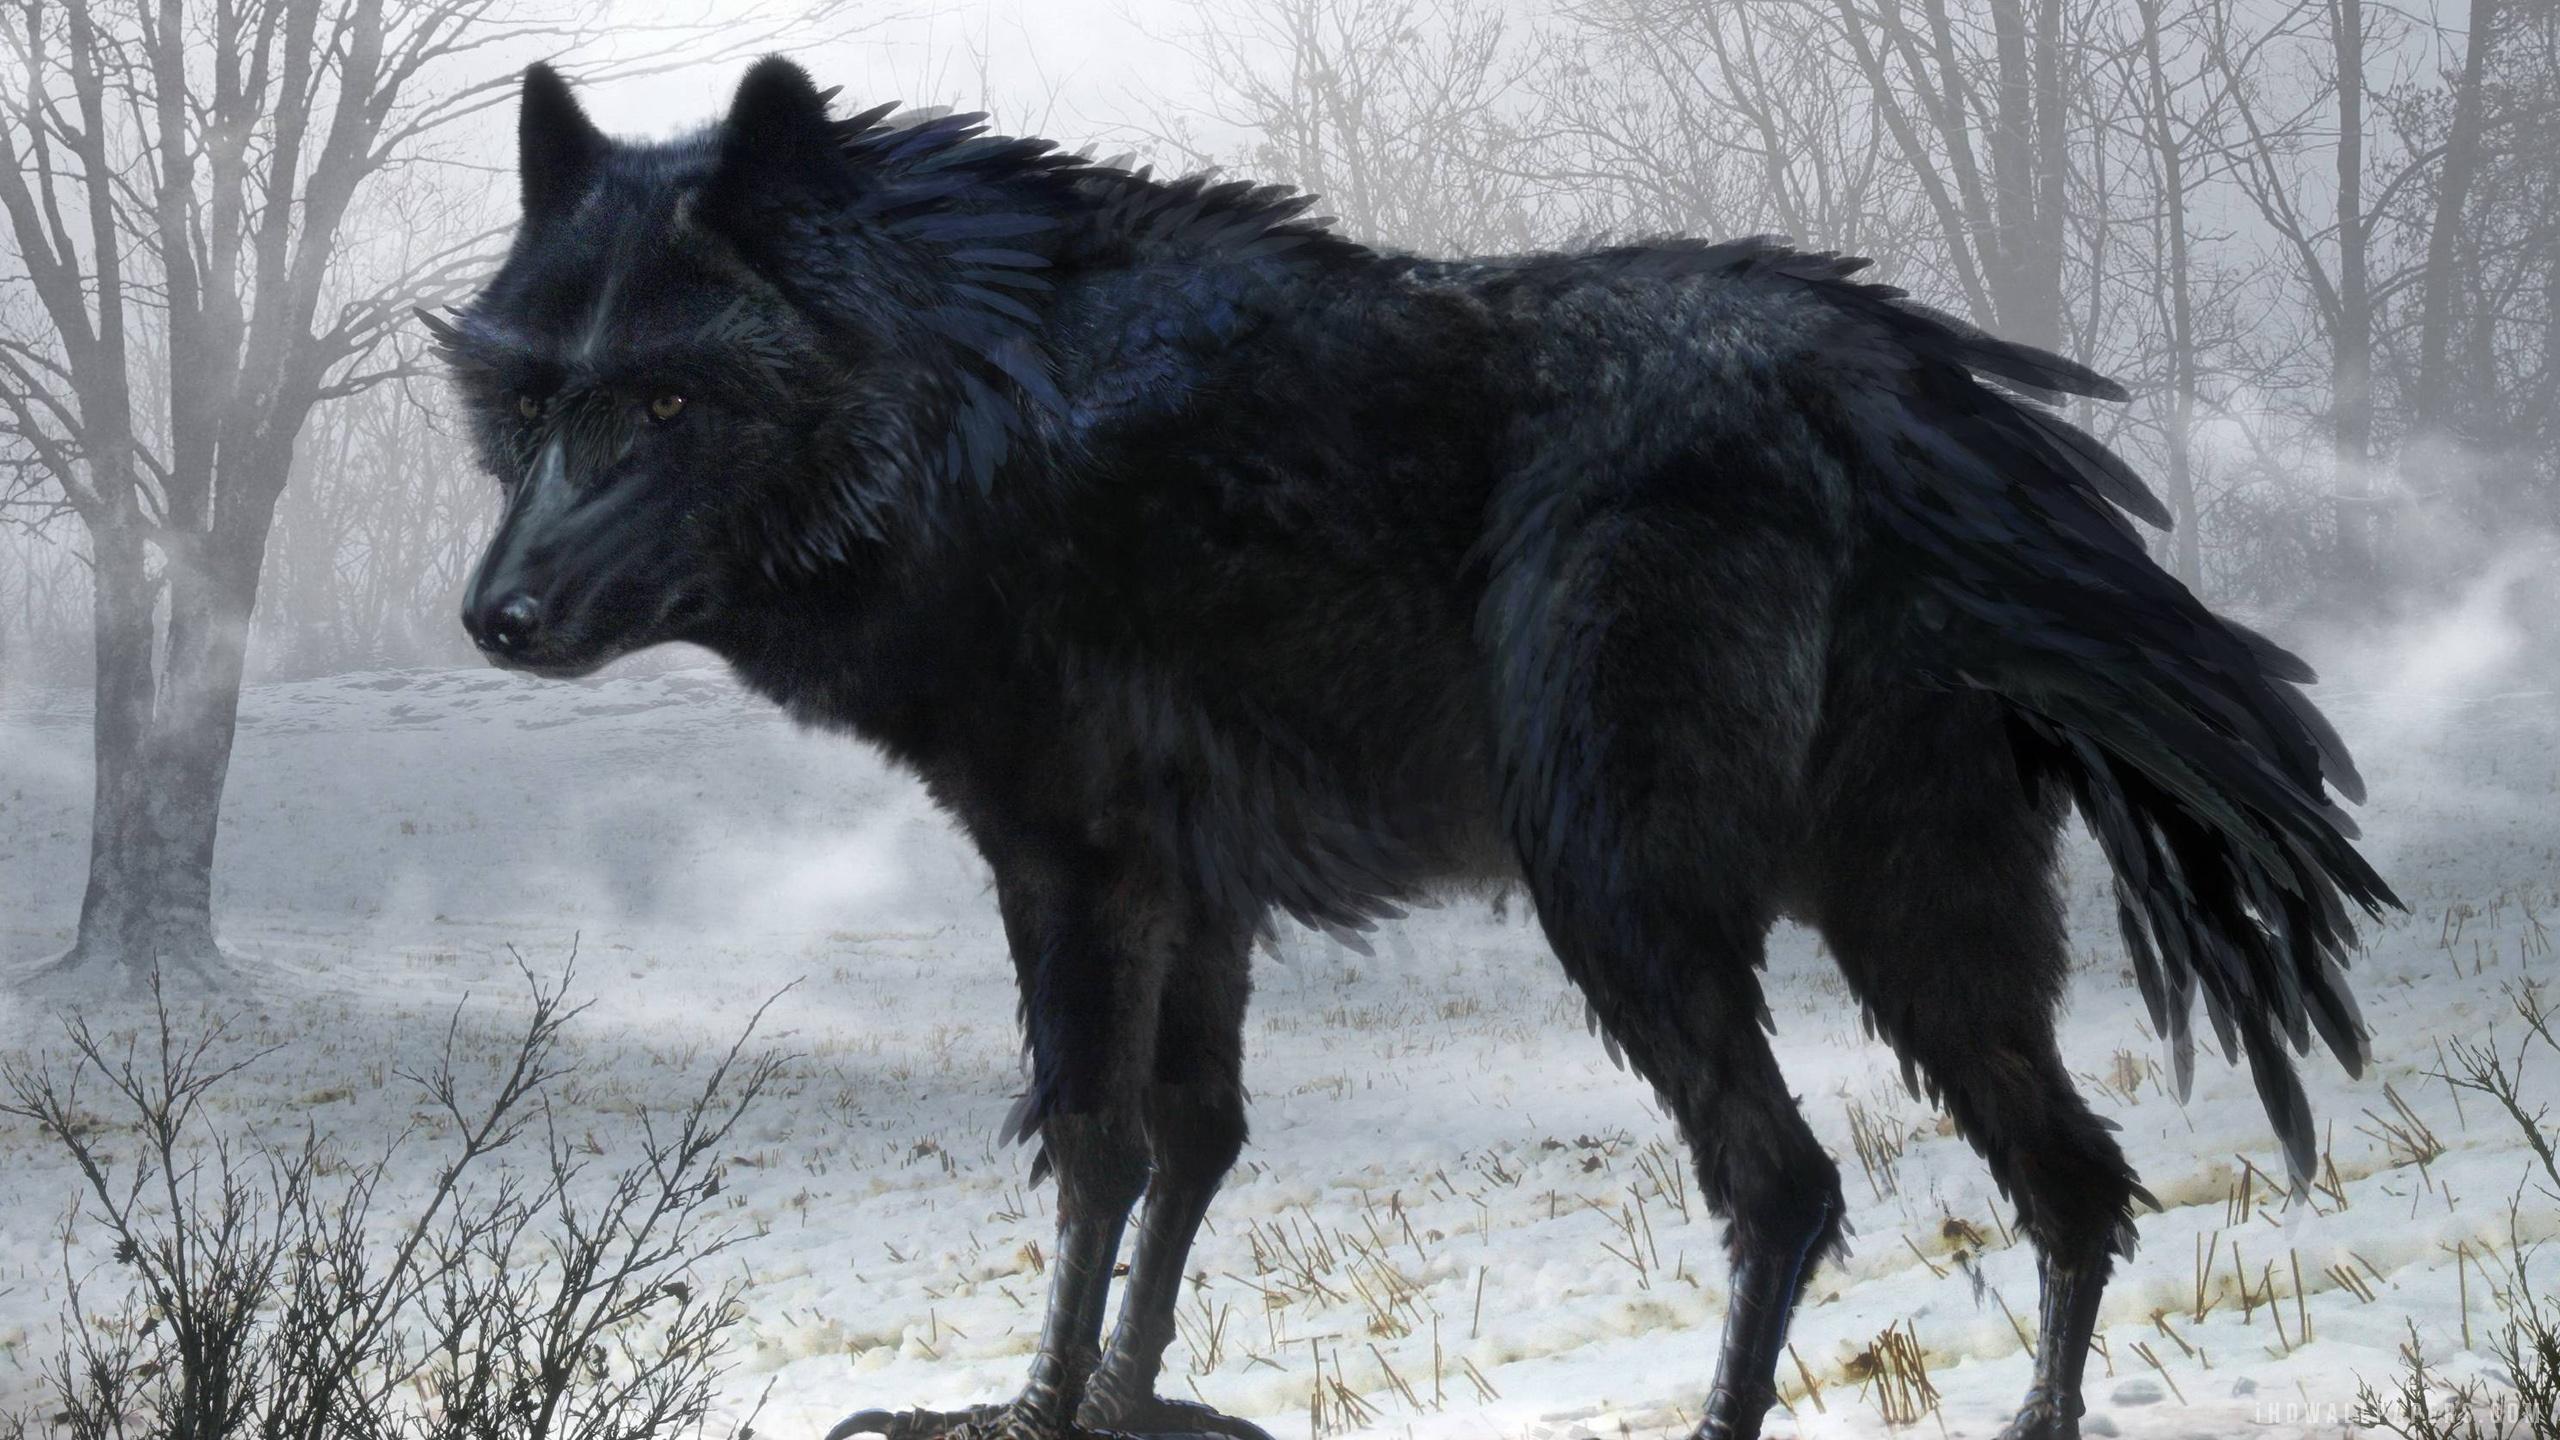 Black Wolf Art Wallpaper 2560x1440